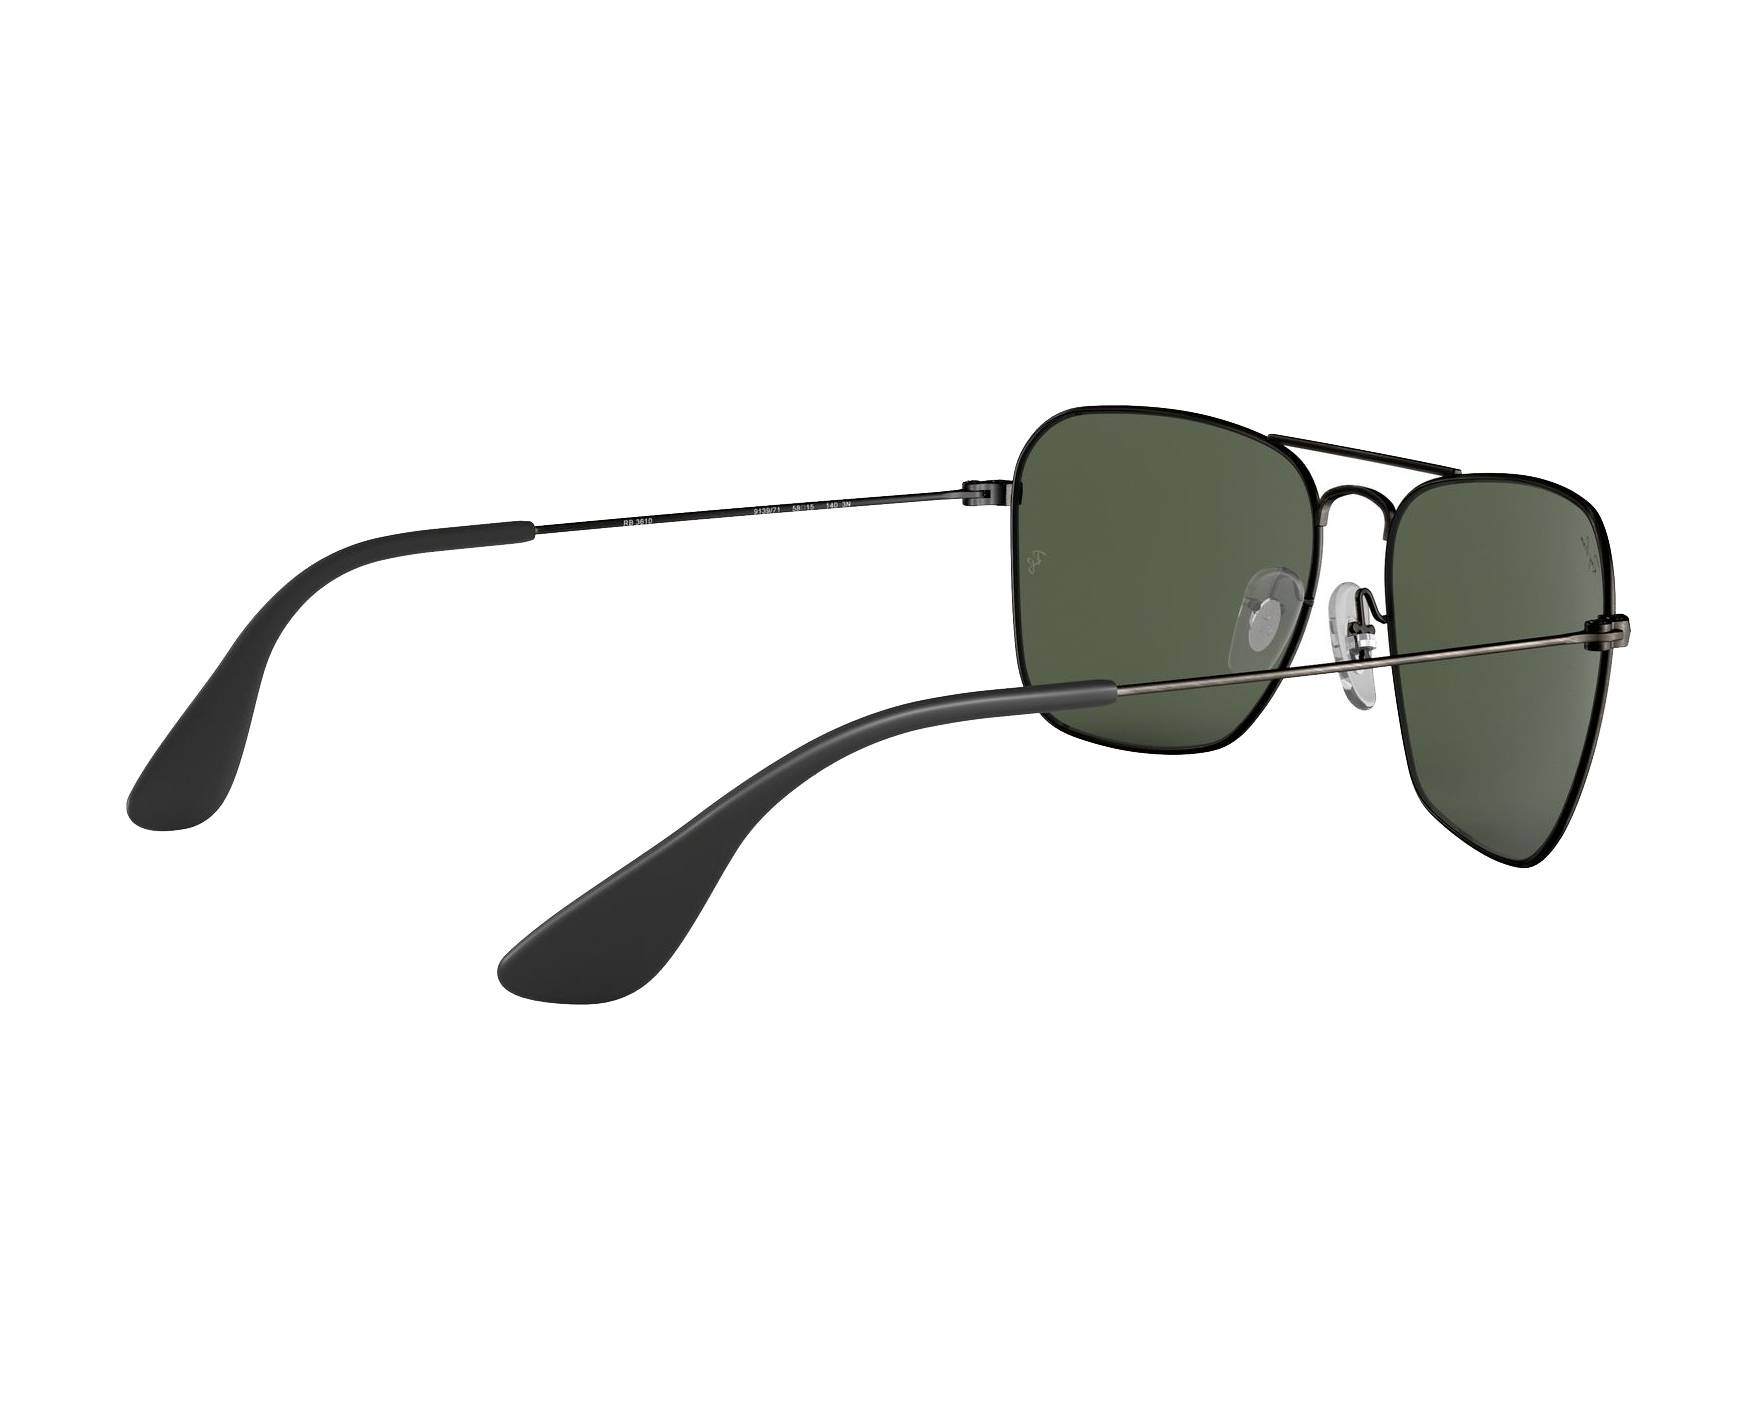 d50103cd8d8 Sunglasses Ray-Ban RB-3610 913971 58-15 Gun 360 degree view 9